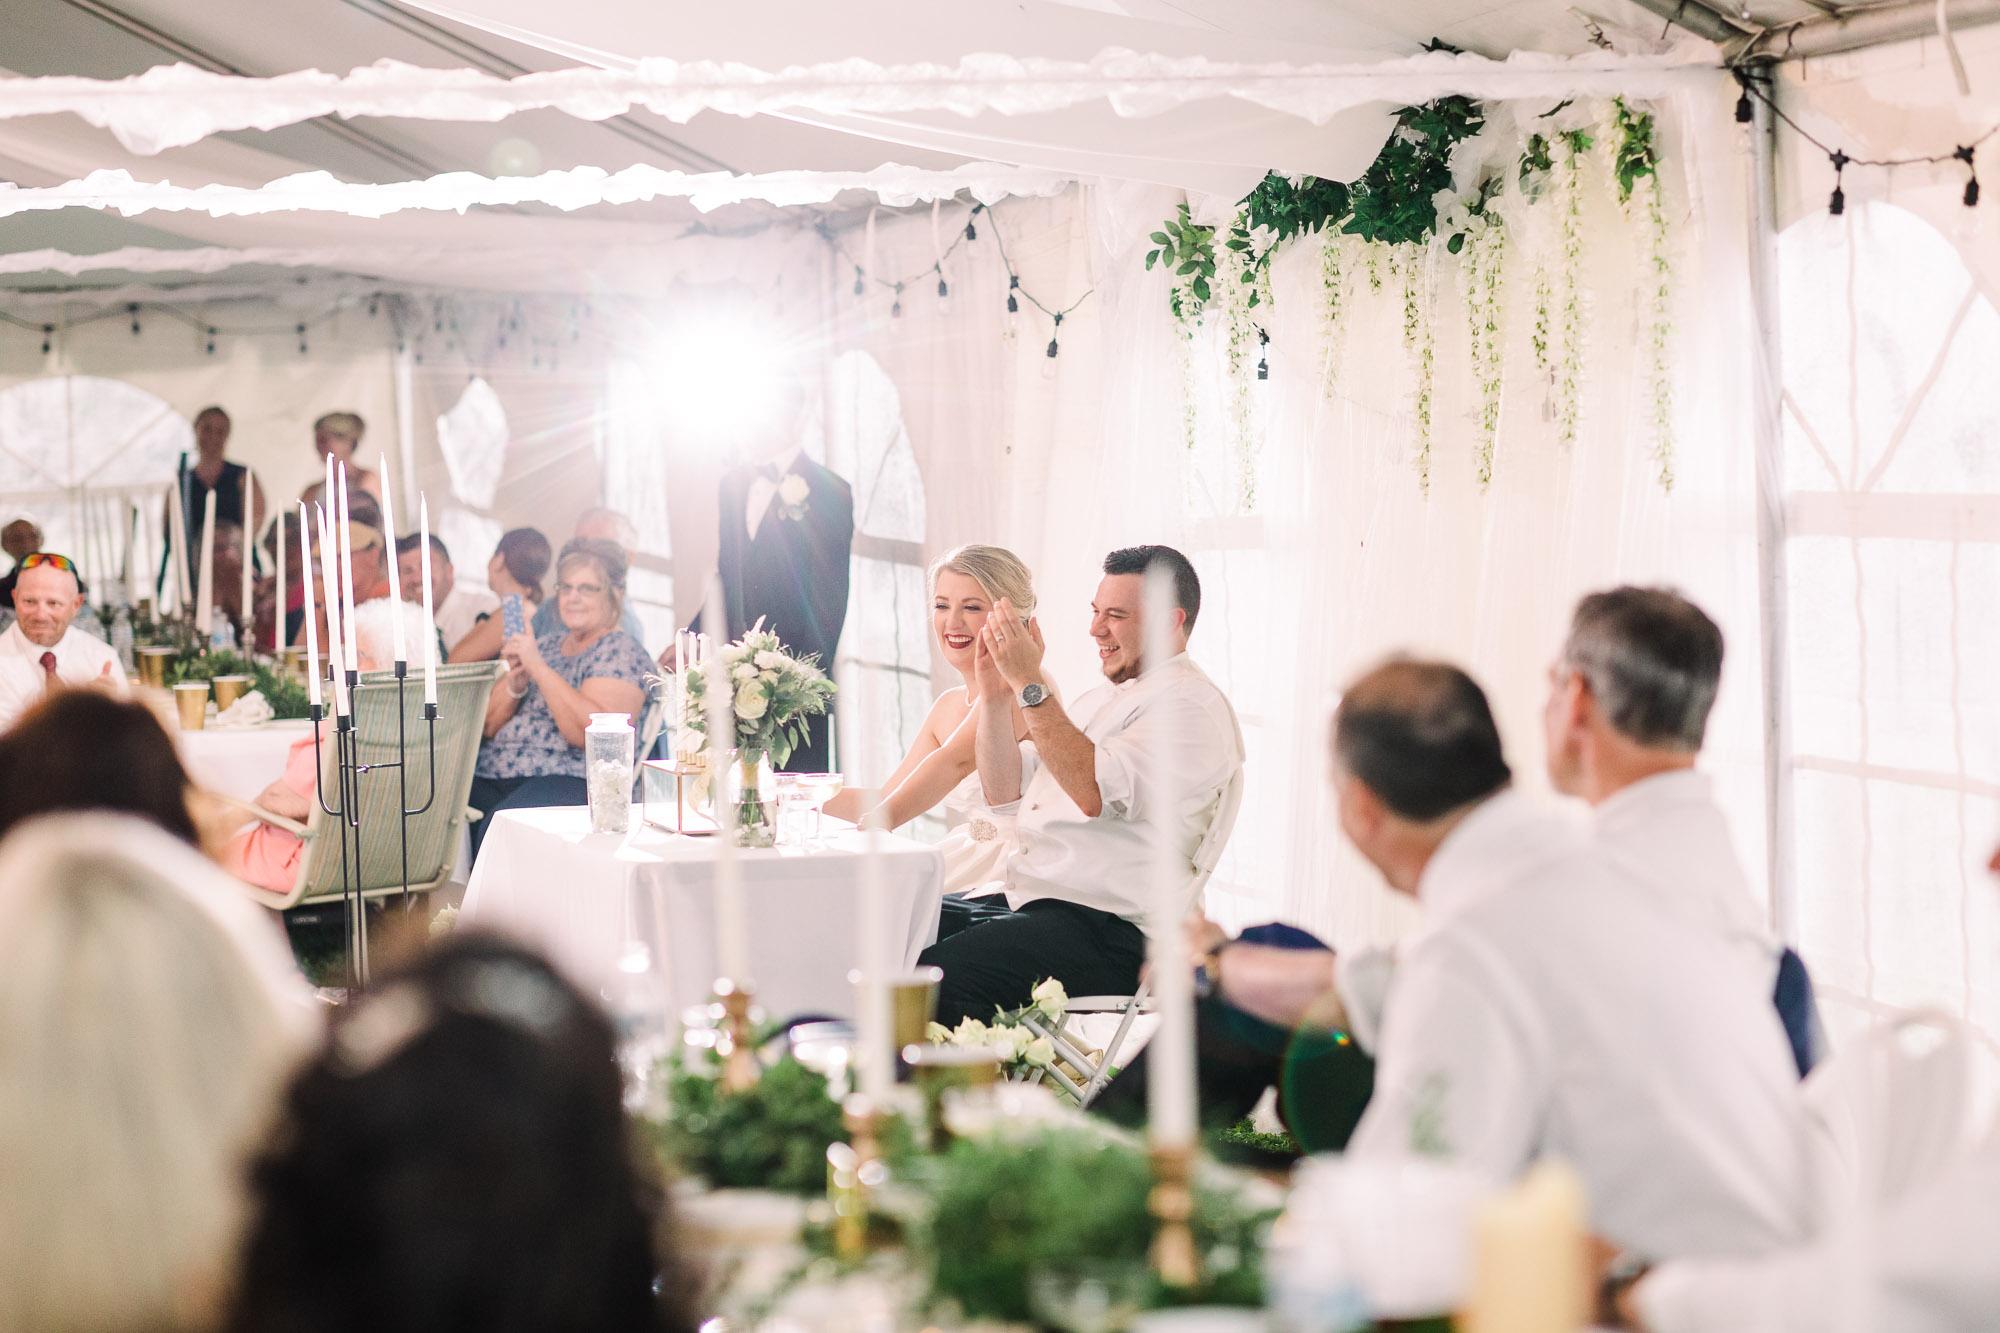 isle-of-que-wedding-4193.jpg